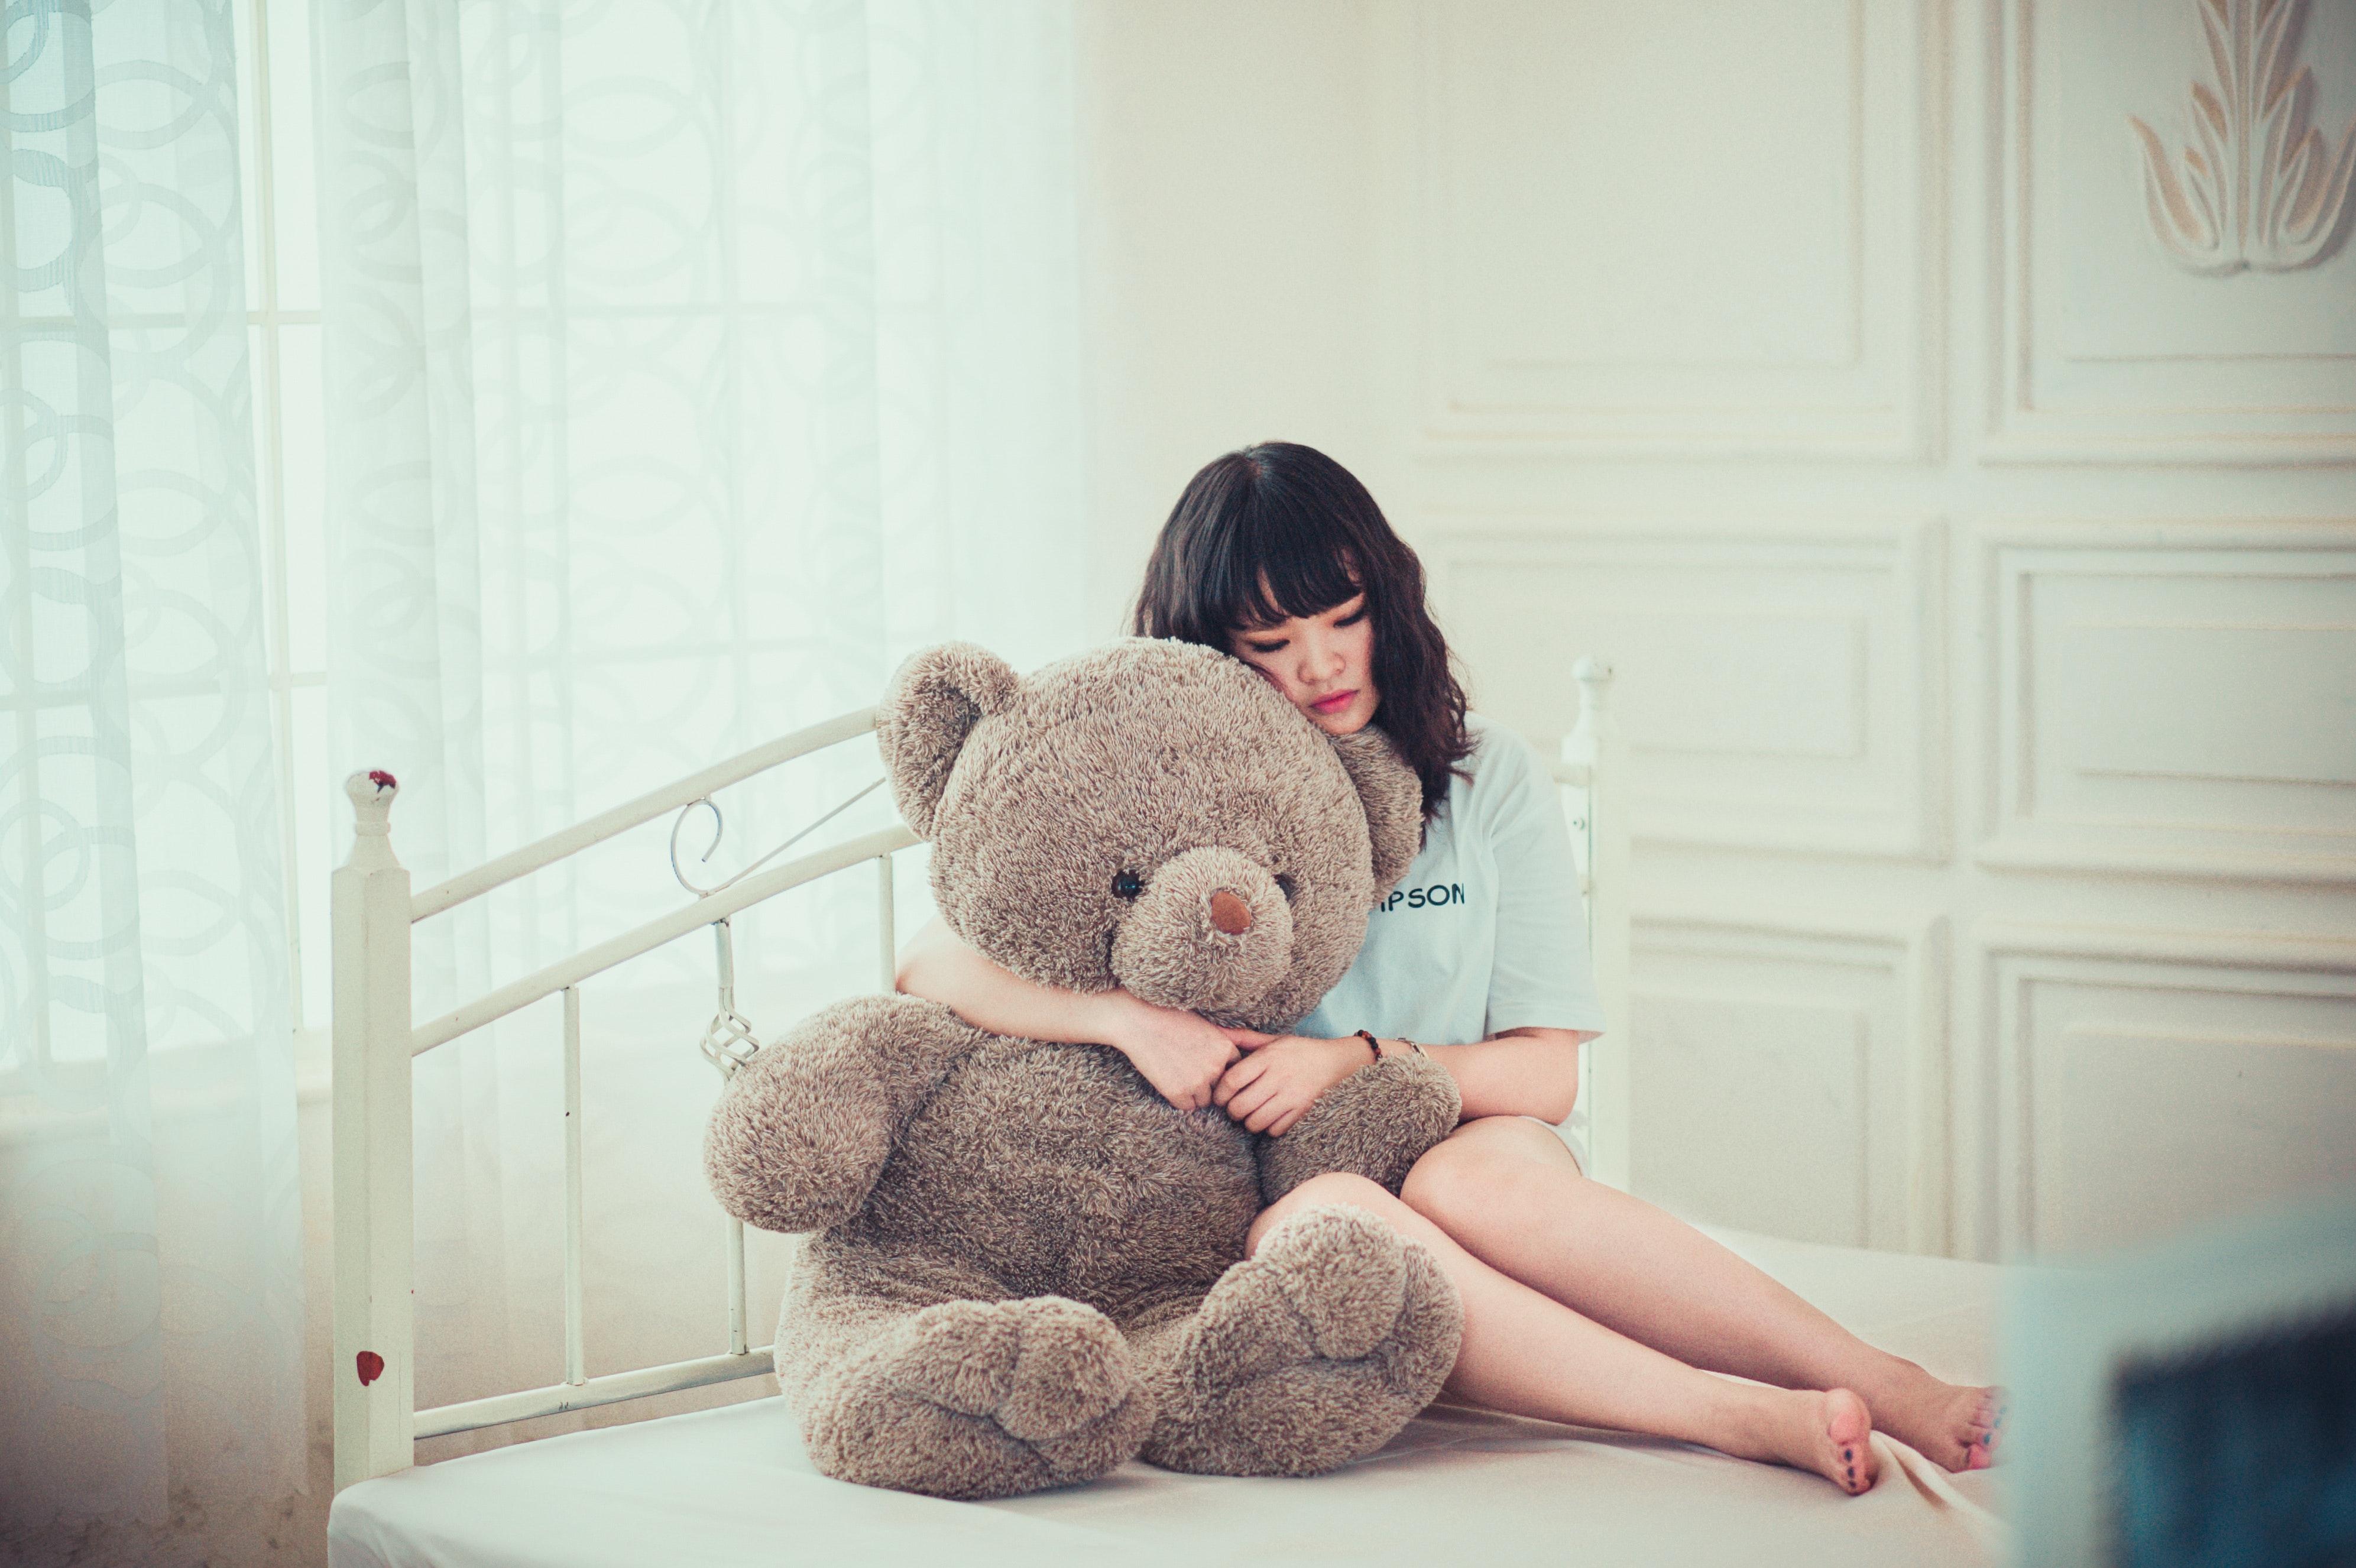 adult-beautiful-bedroom-cute-206402